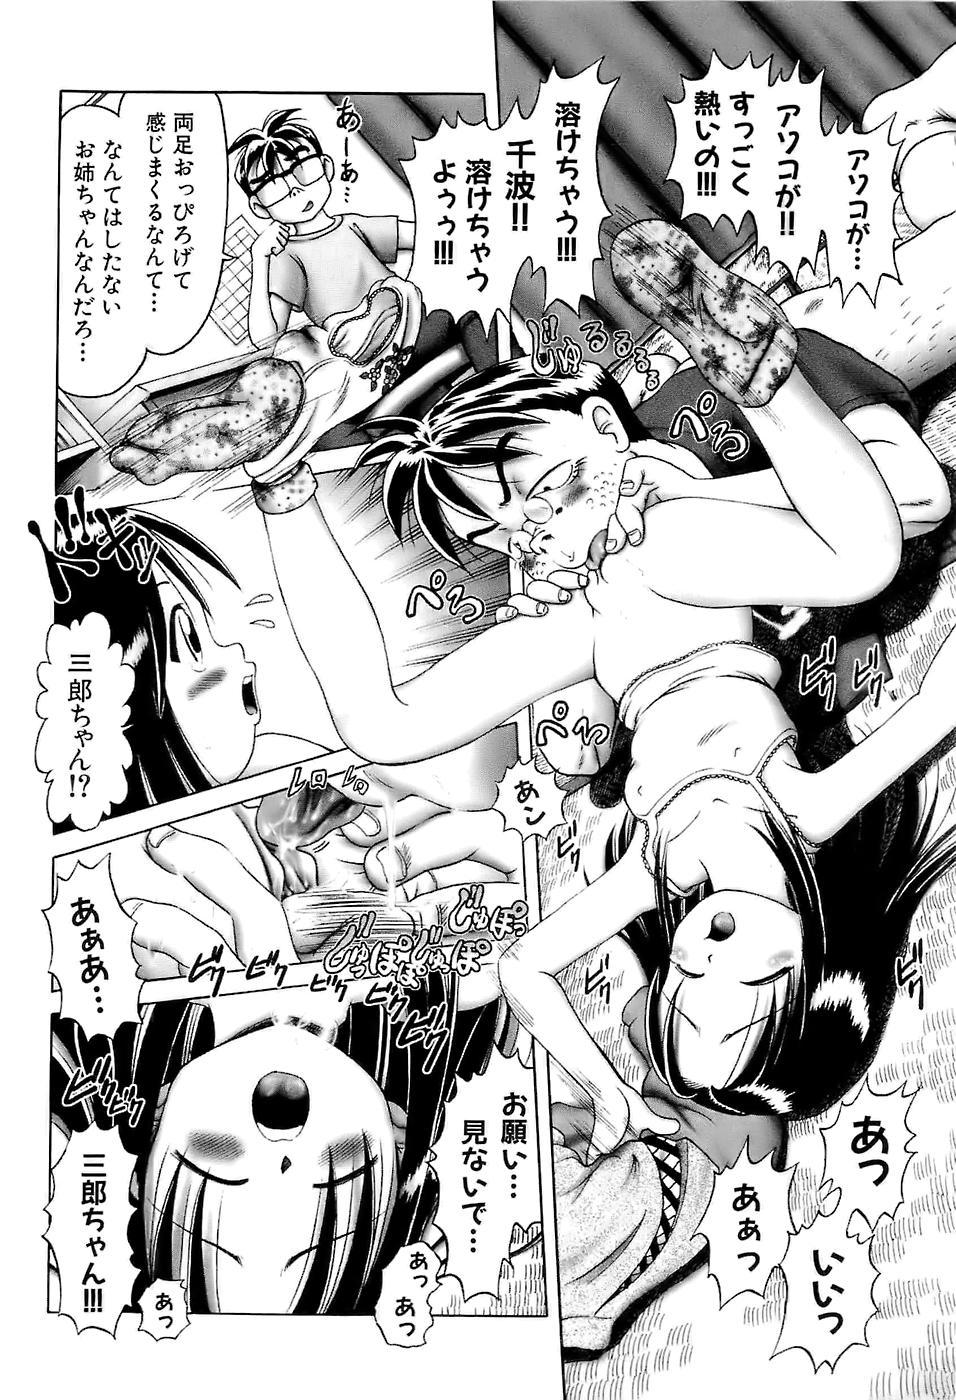 [Bow Rei] Osanai Kajitsu -Inkou Shougakusei no Houkago- Jou 27